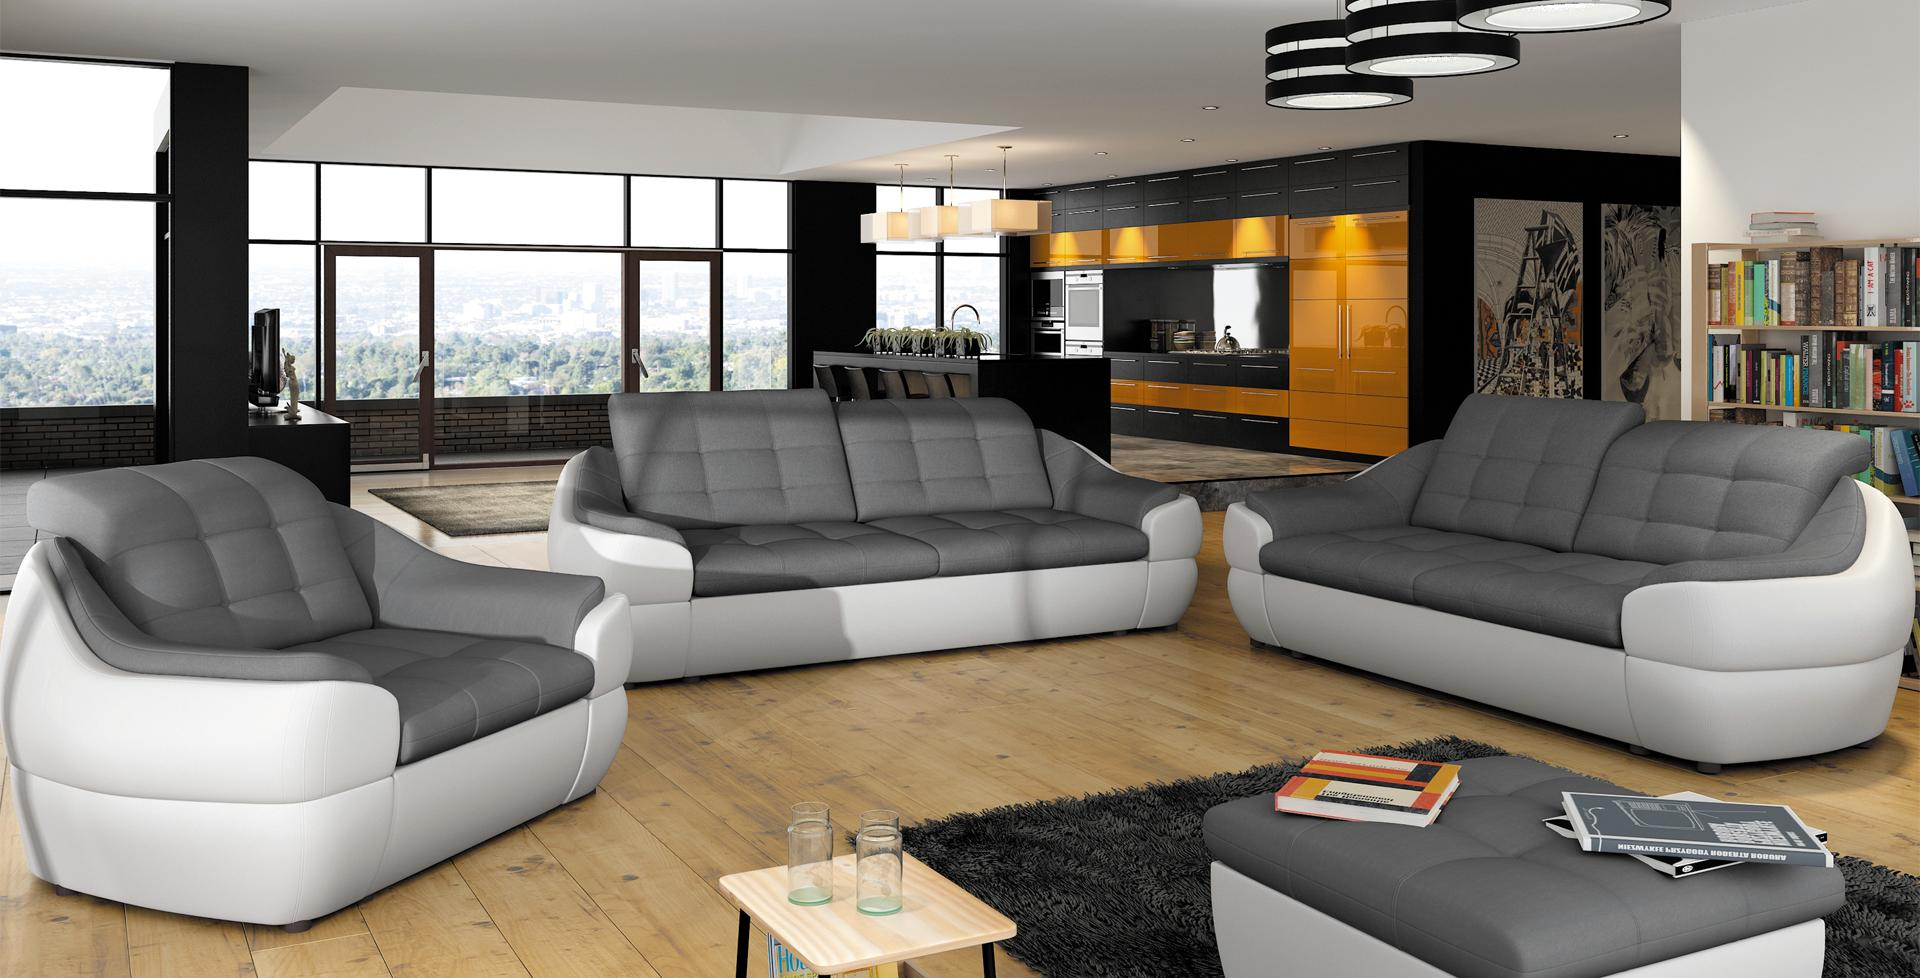 Full Size of Couchgarnitur Leder Kaufen Sofa Garnitur 3 Teilig Echtleder Sofa Garnitur 3/2/1 Eiche Massivholz Moderne Garnituren 3 2 1 Kasper Wohndesign Schwarz Sofa Sofa Garnitur